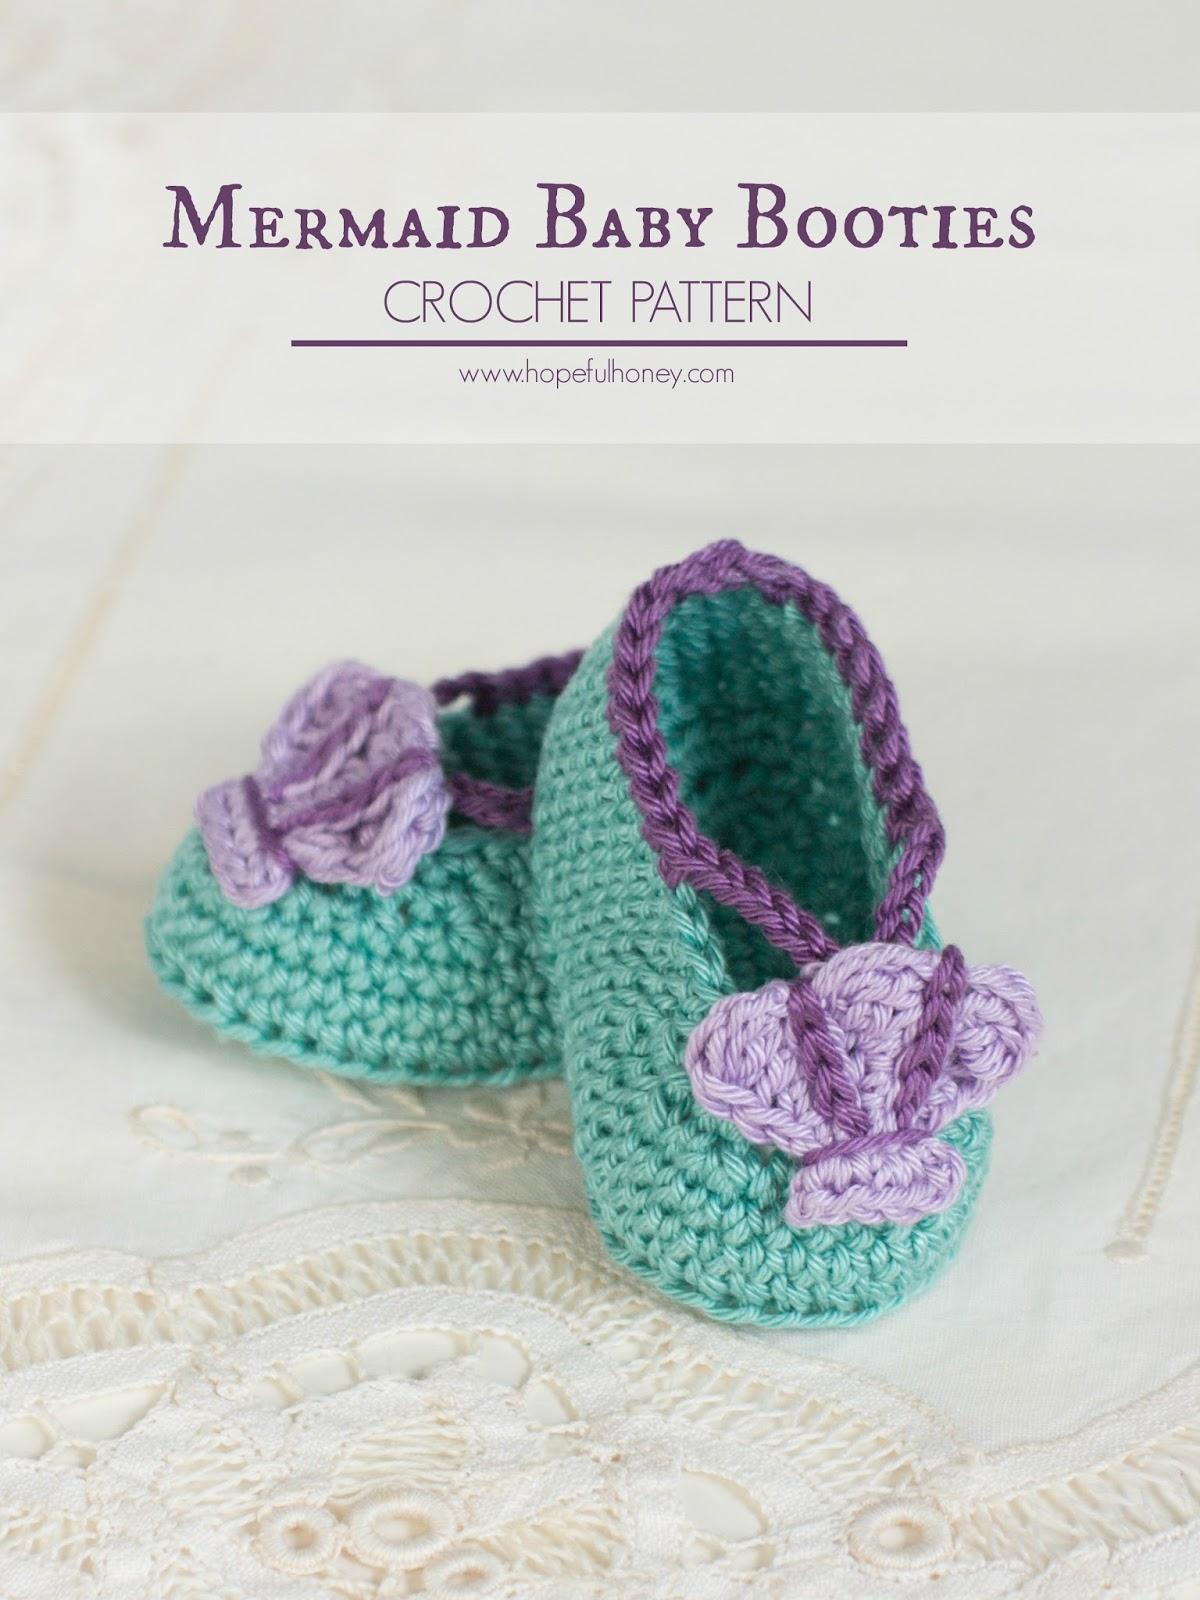 Free Crochet Patterns For Baby Mermaid : Hopeful Honey Craft, Crochet, Create: Mermaid Baby ...